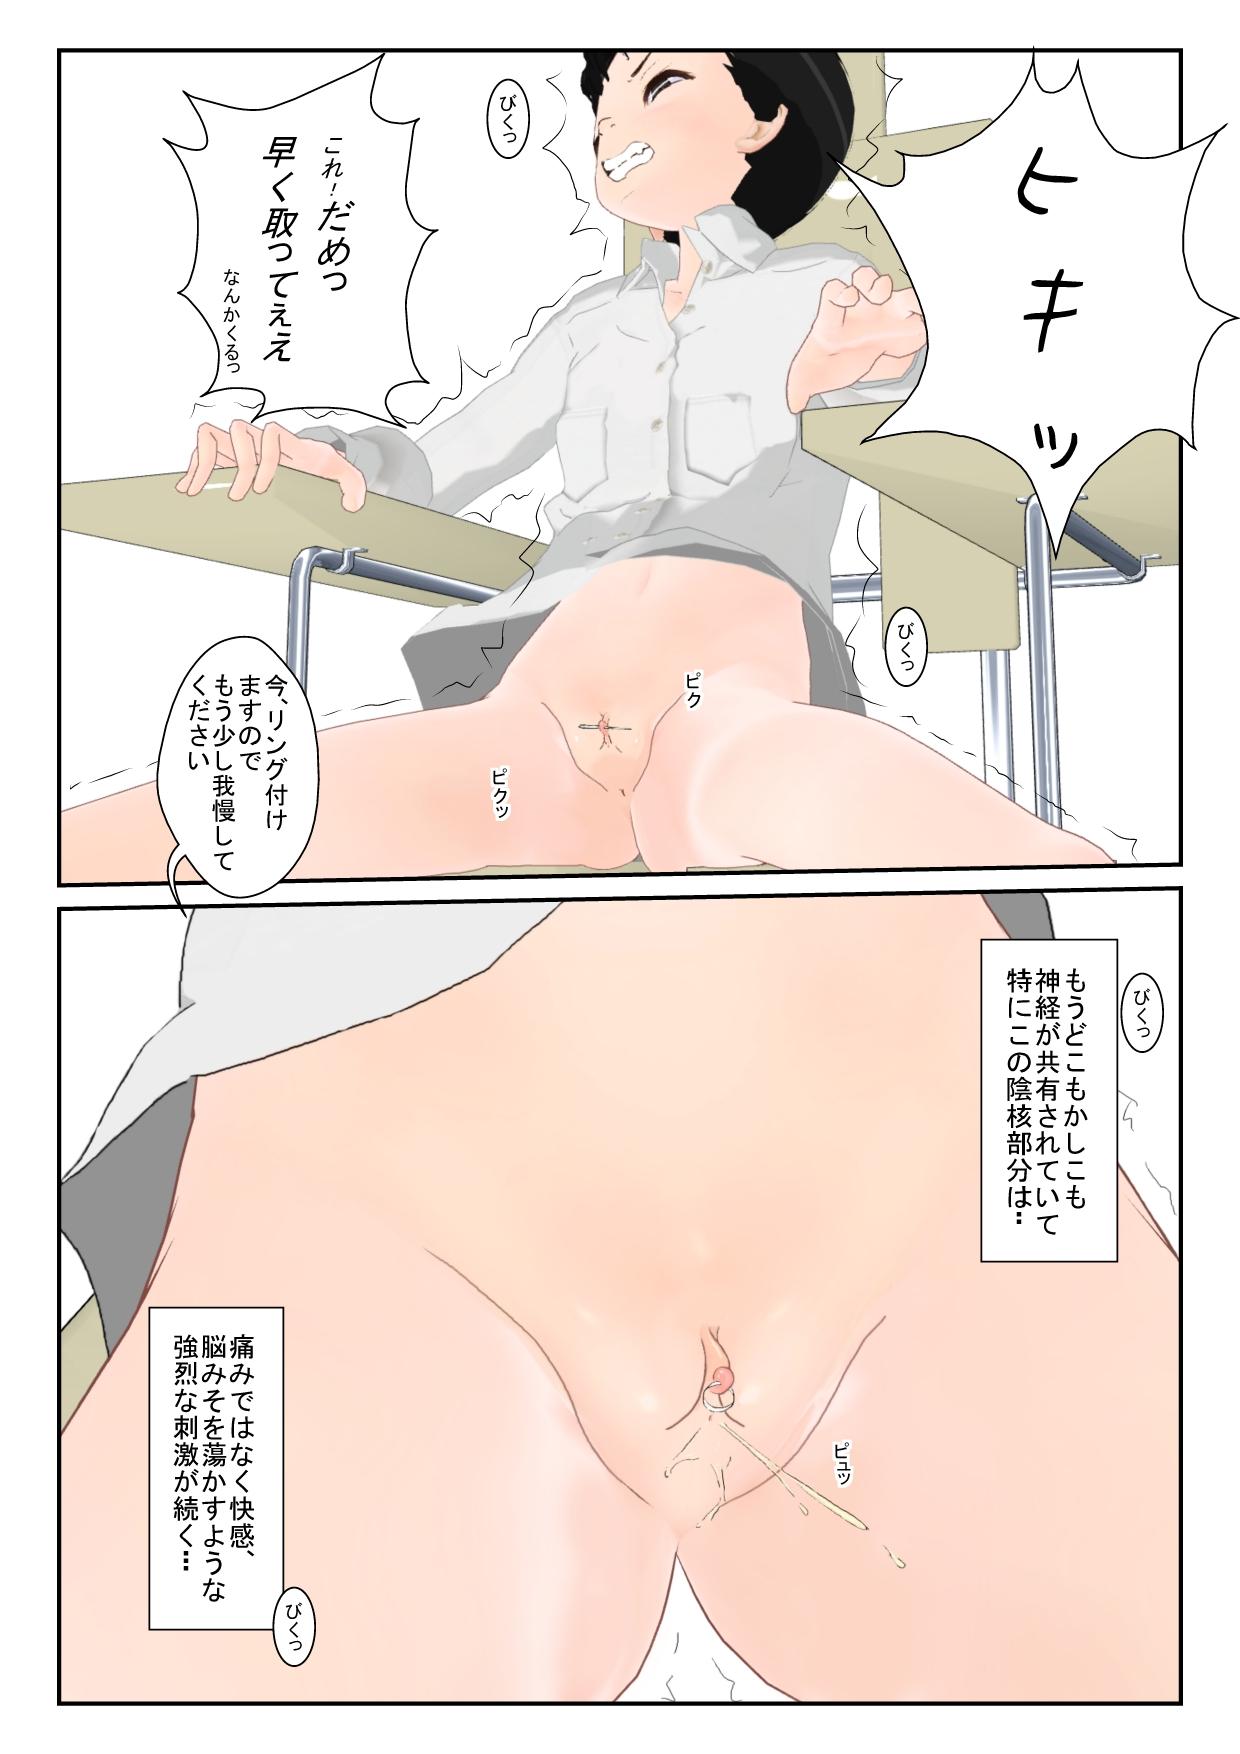 hirakuri0007.jpg